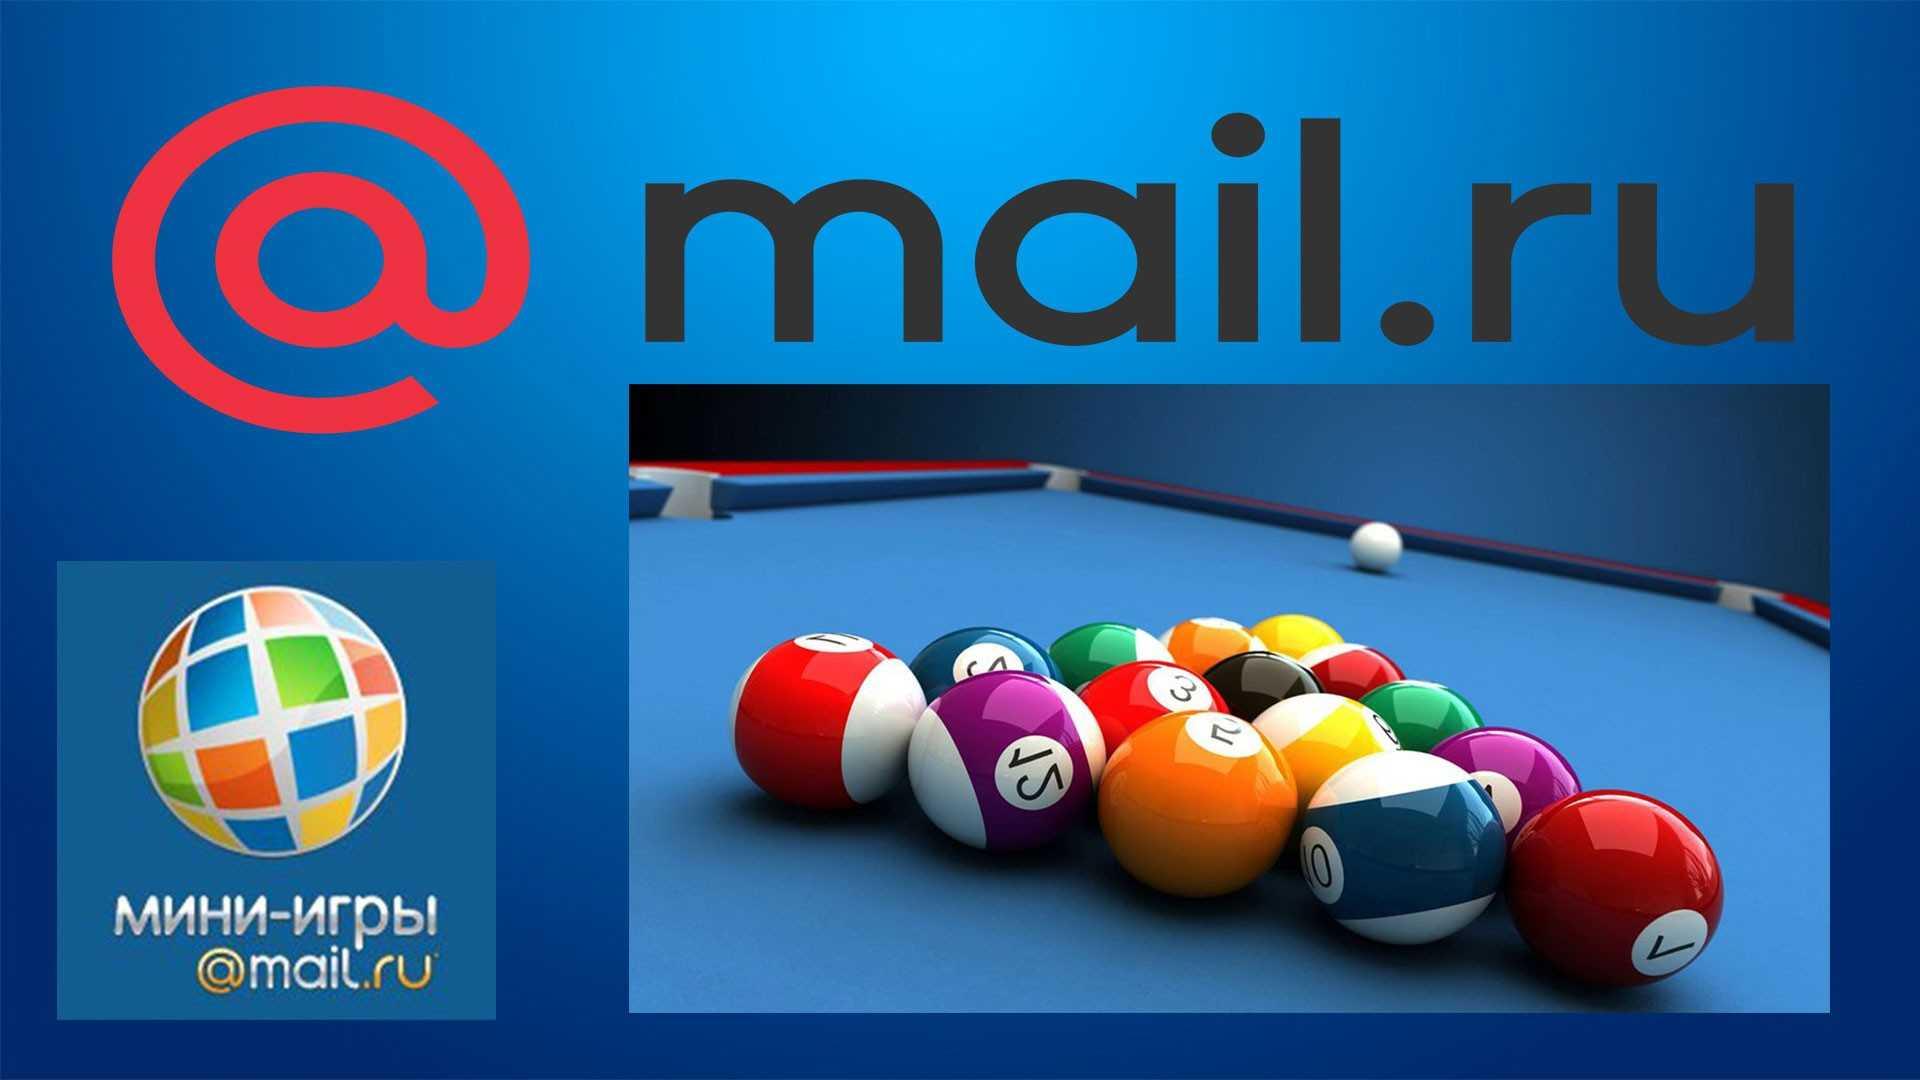 Игры Mail.ru - бильярд восьмёрка